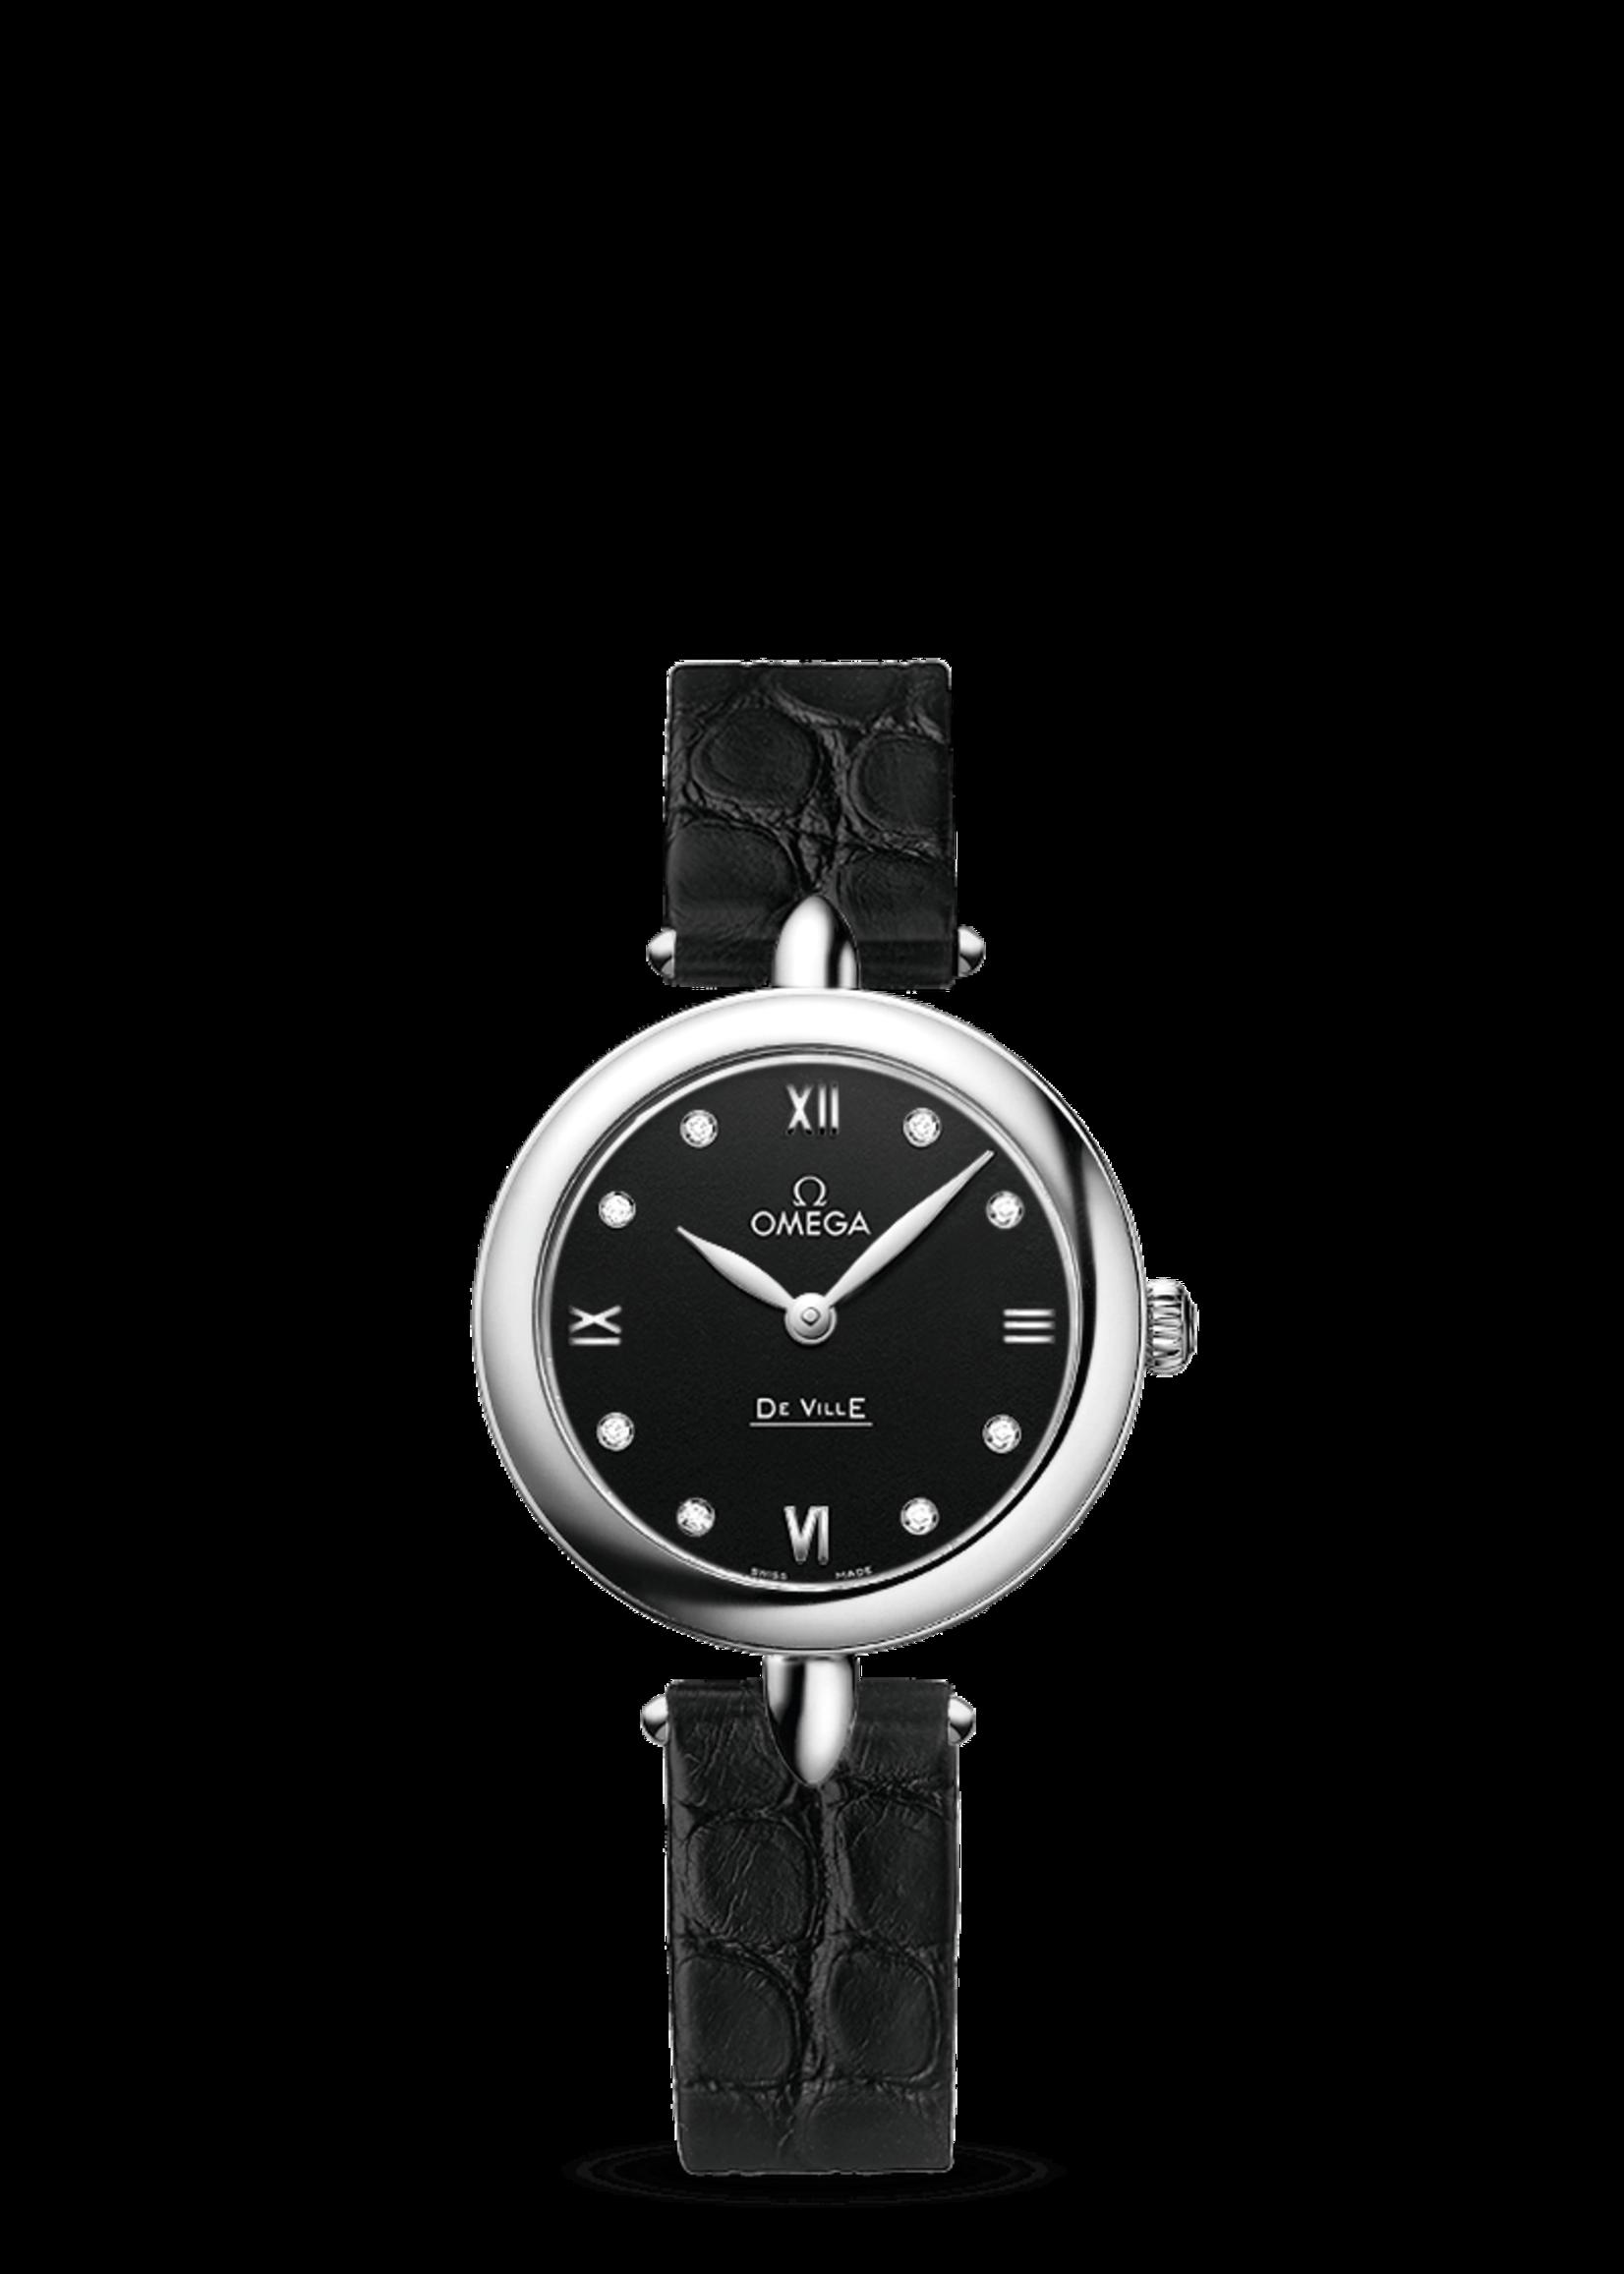 Omega Watches OMEGA DE VILLE (2020 B+P) #42413276051001